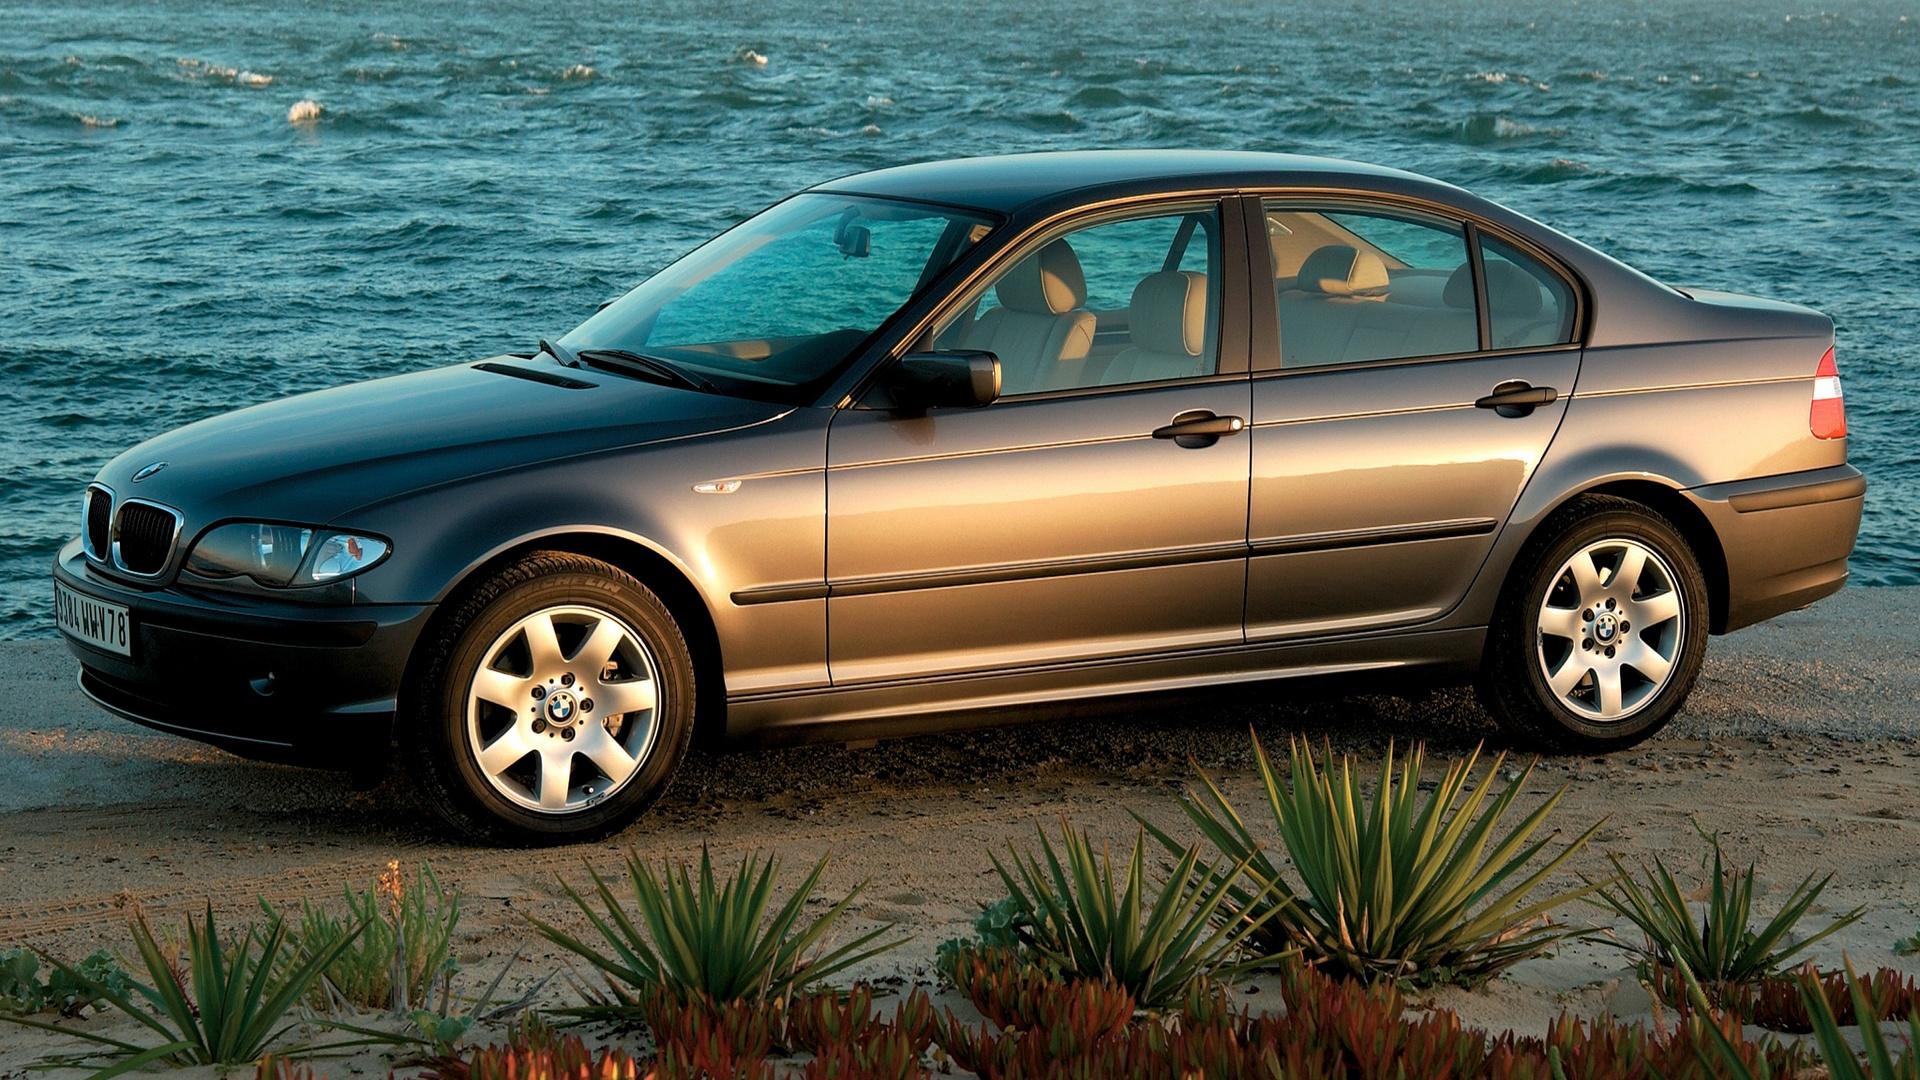 BMW 320d Sedan (E46) 2001–05 | autofakty.pl (fot. materiały prasowe)